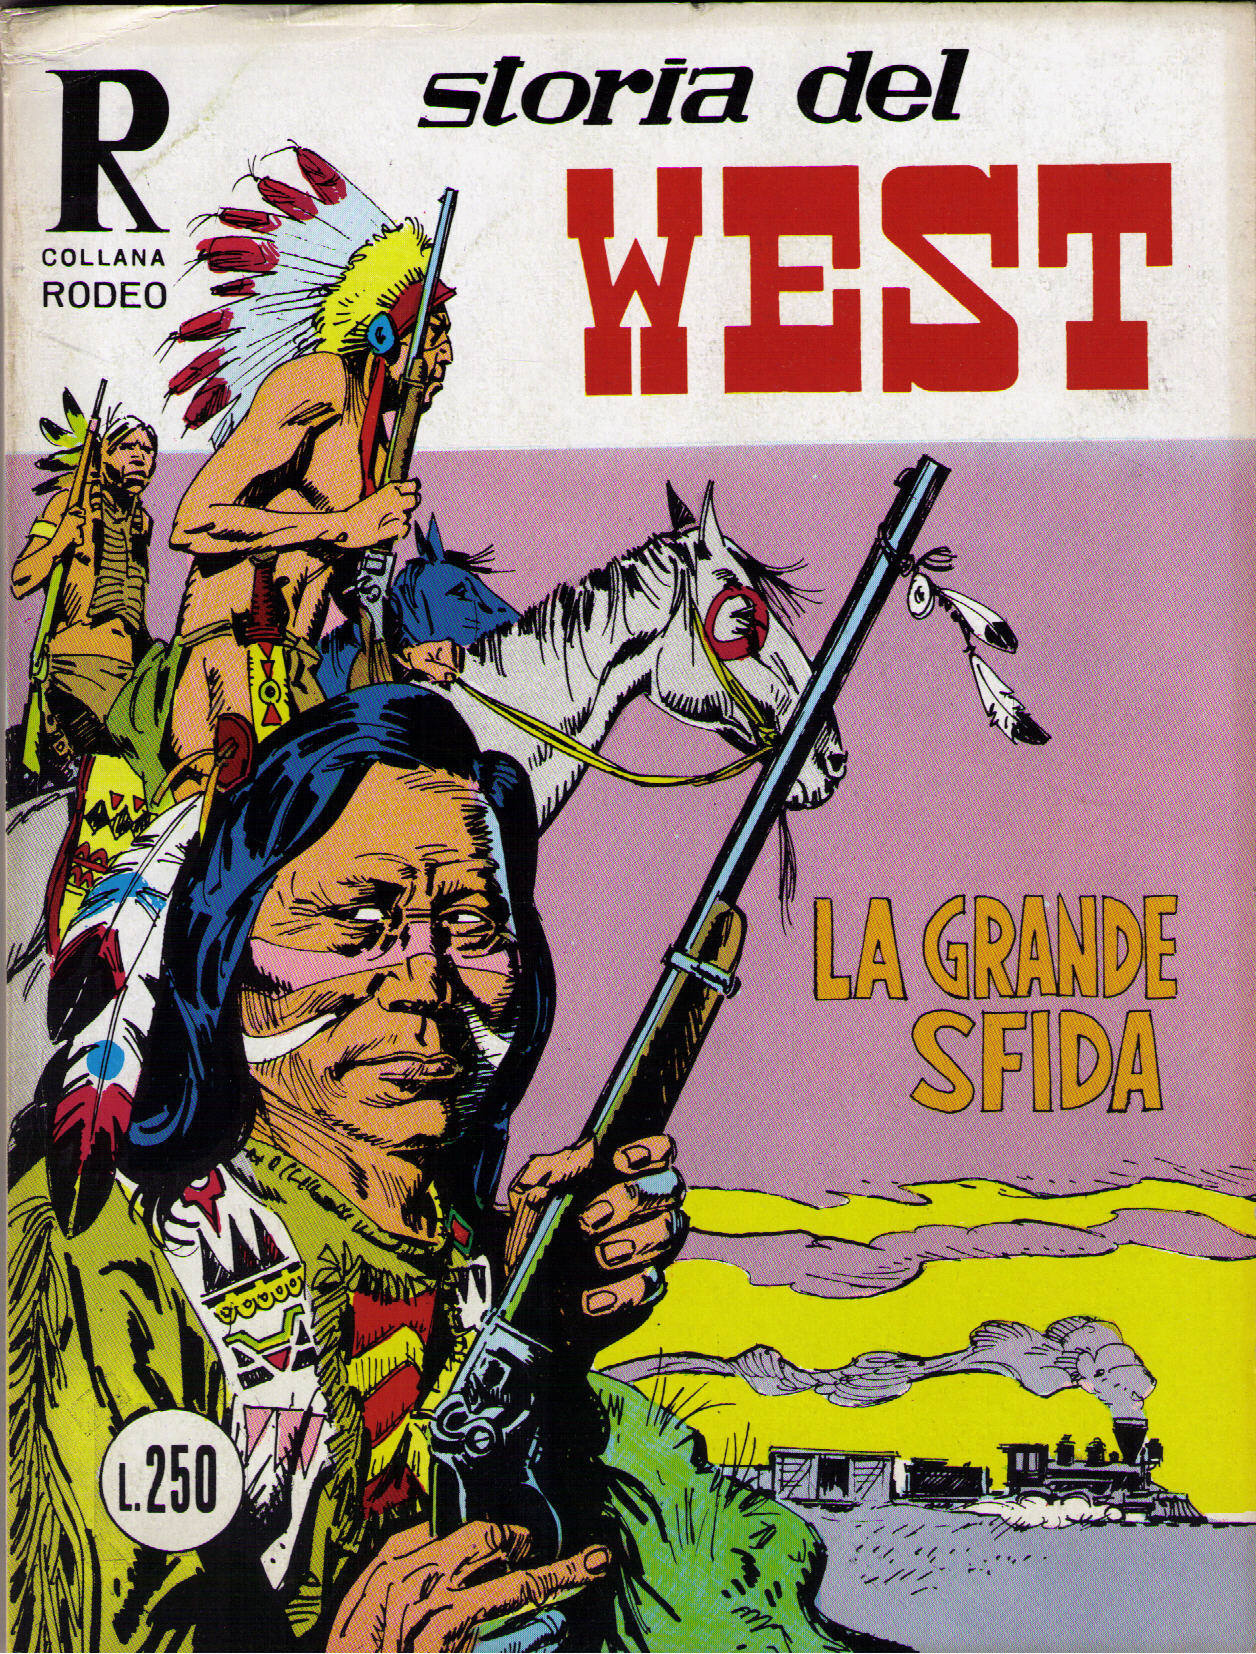 Storia del West n. 34 (Collana Rodeo n. 76)